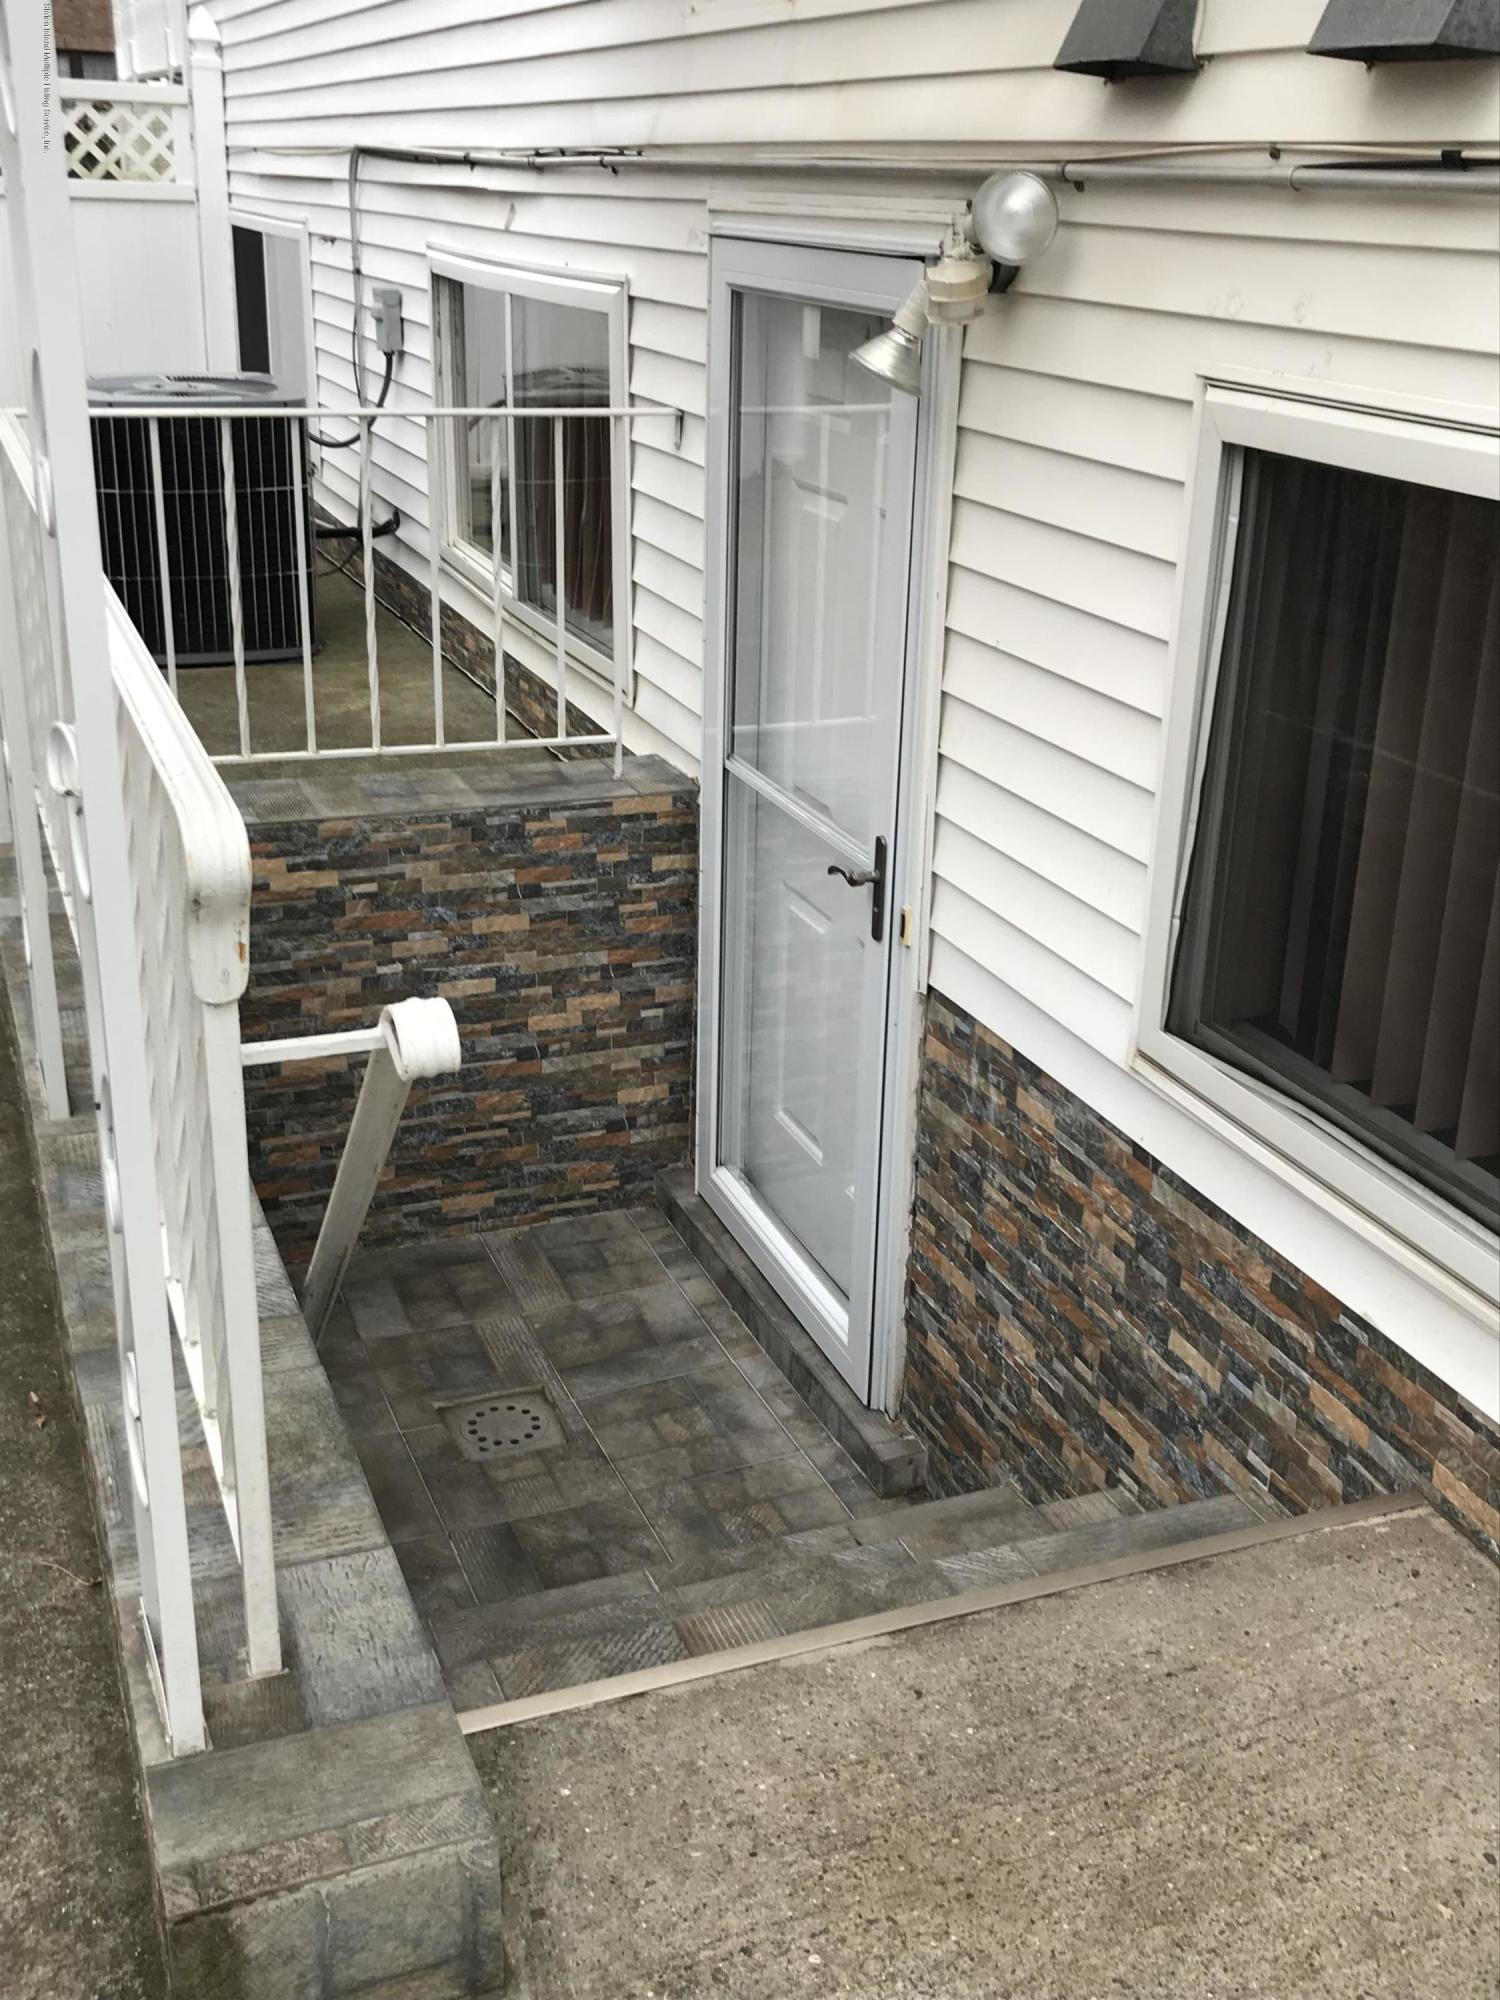 Two Family - Semi-Attached 51 Whitman Avenue  Staten Island, NY 10308, MLS-1124445-17